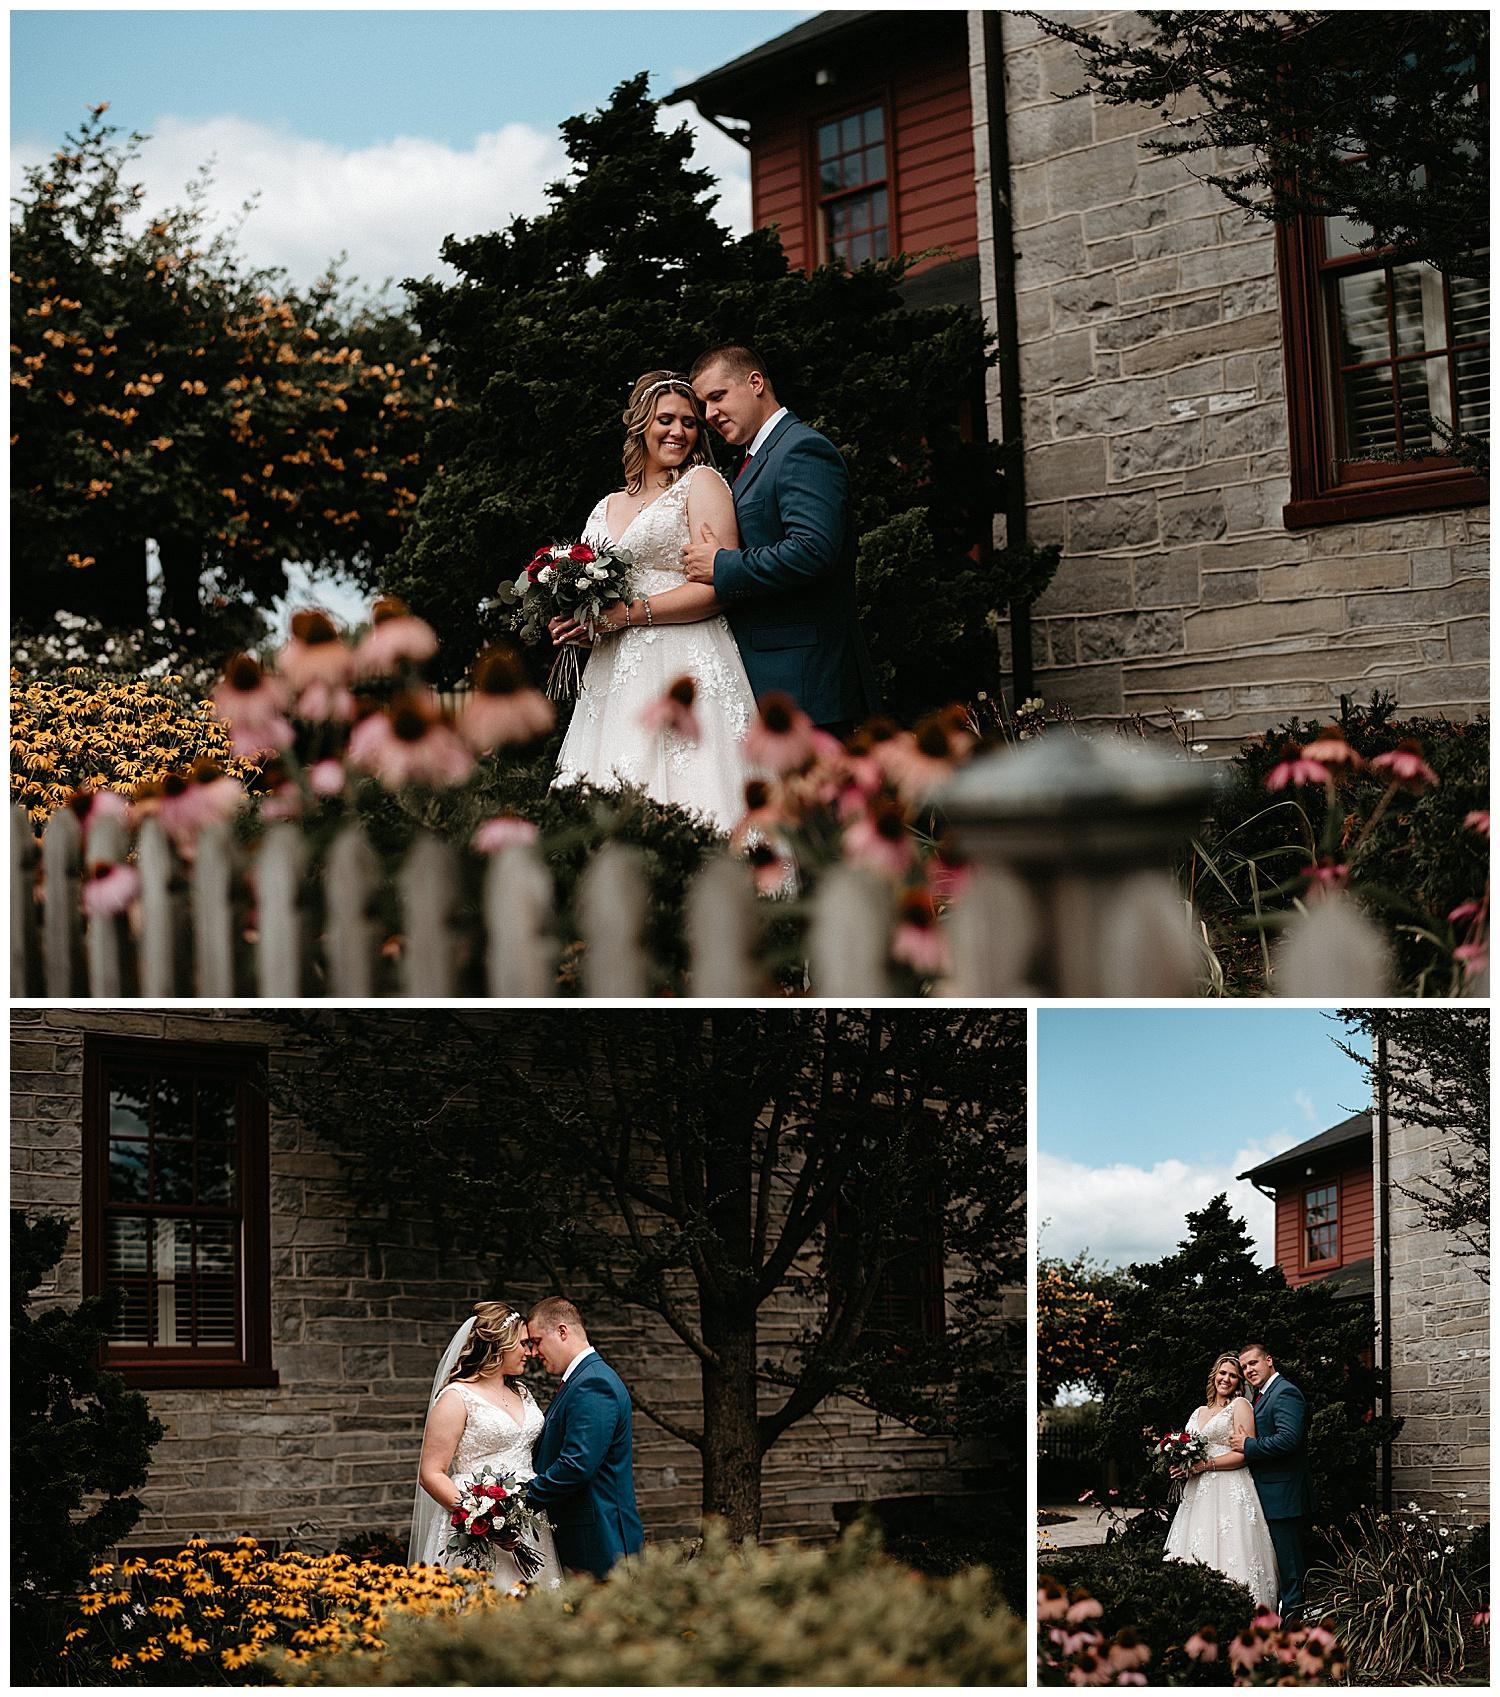 NEPA-Bloomgsburg-Wedding-Photographer-at-The-Barn-at-Greystone-Farms-Watsontown-PA_0041.jpg